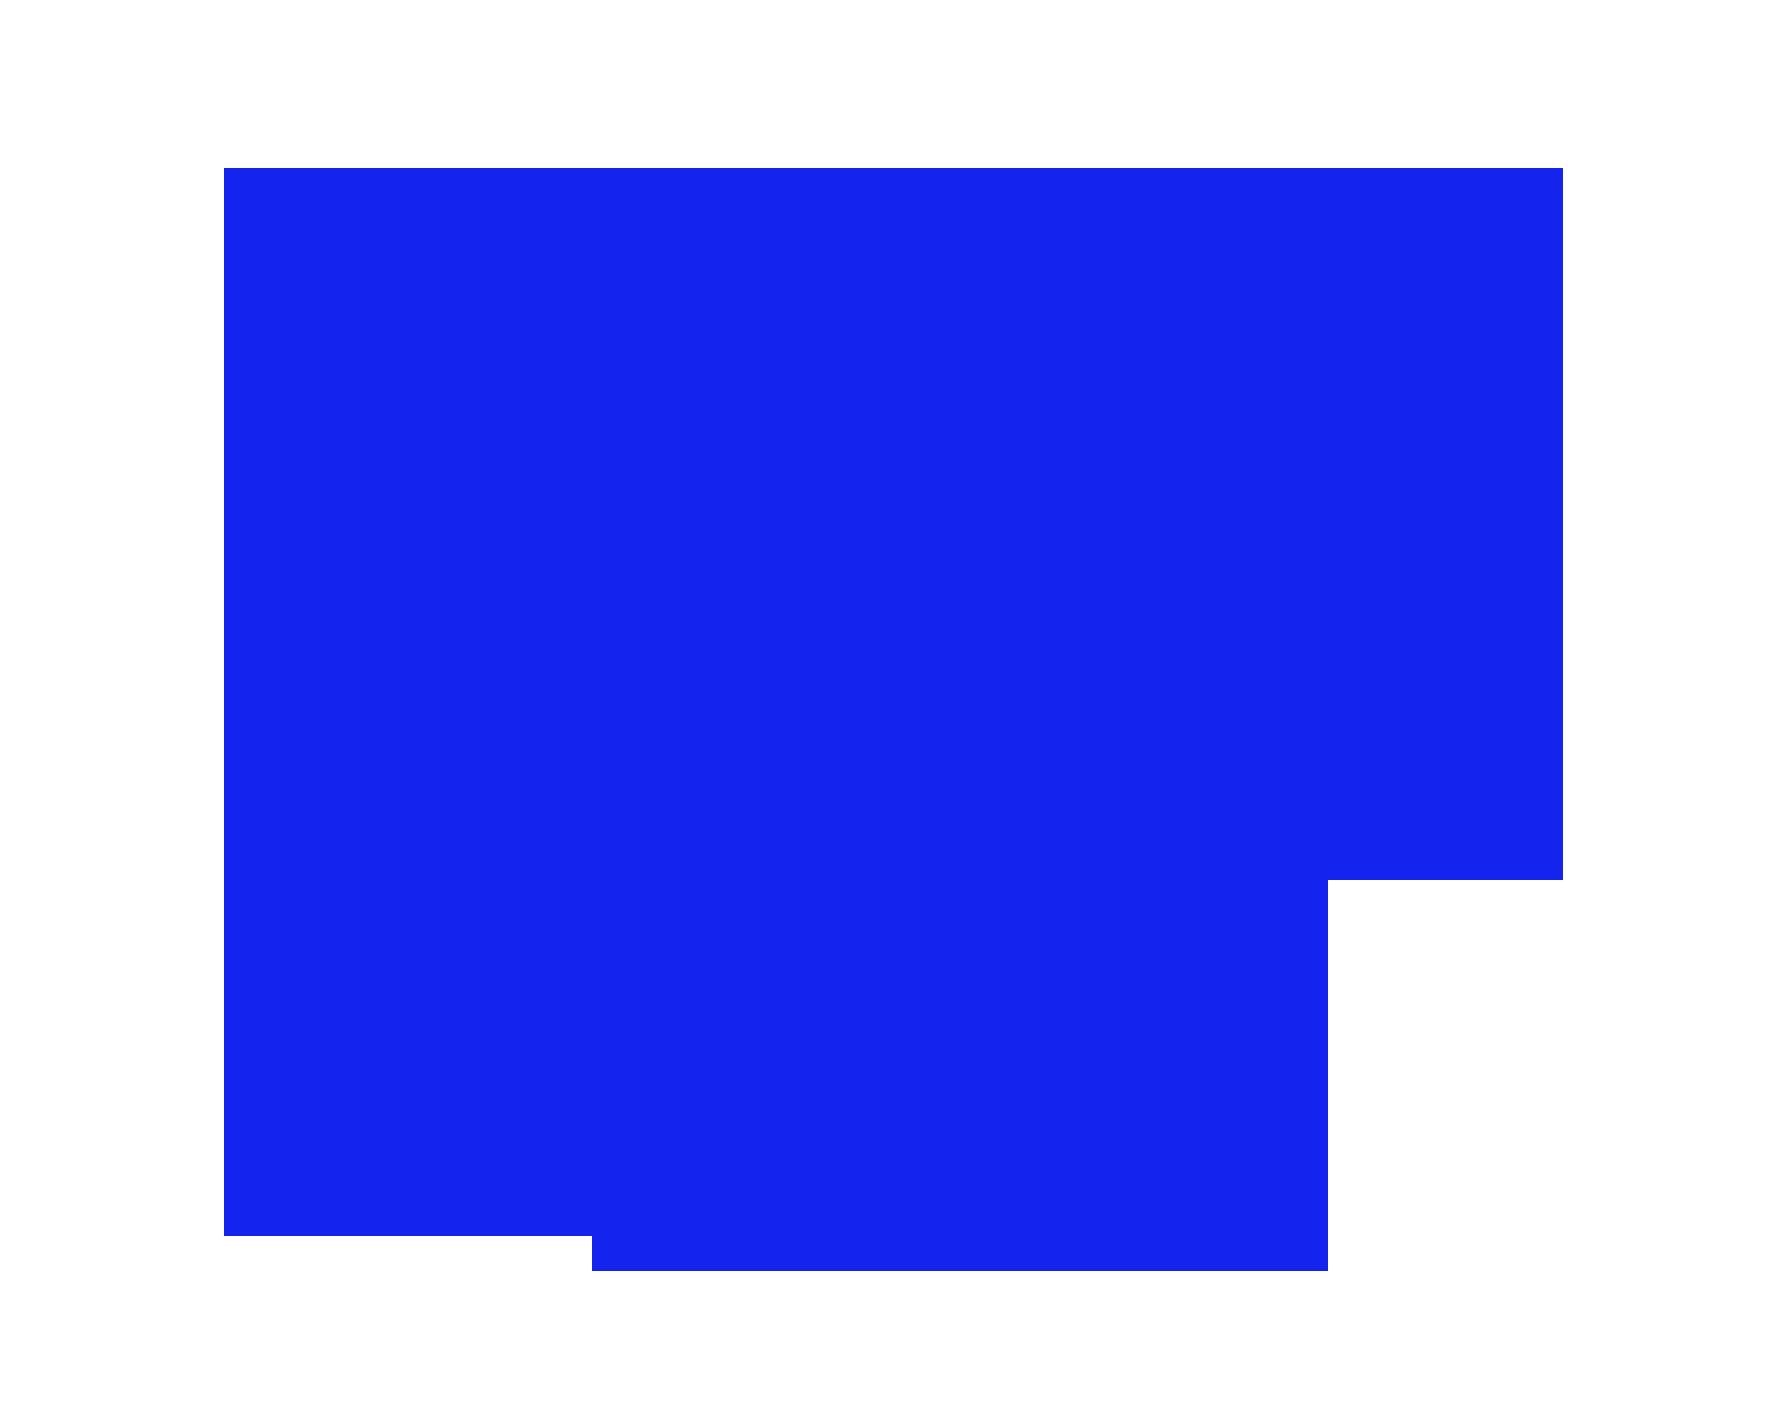 eyesight La Vue pour la vie